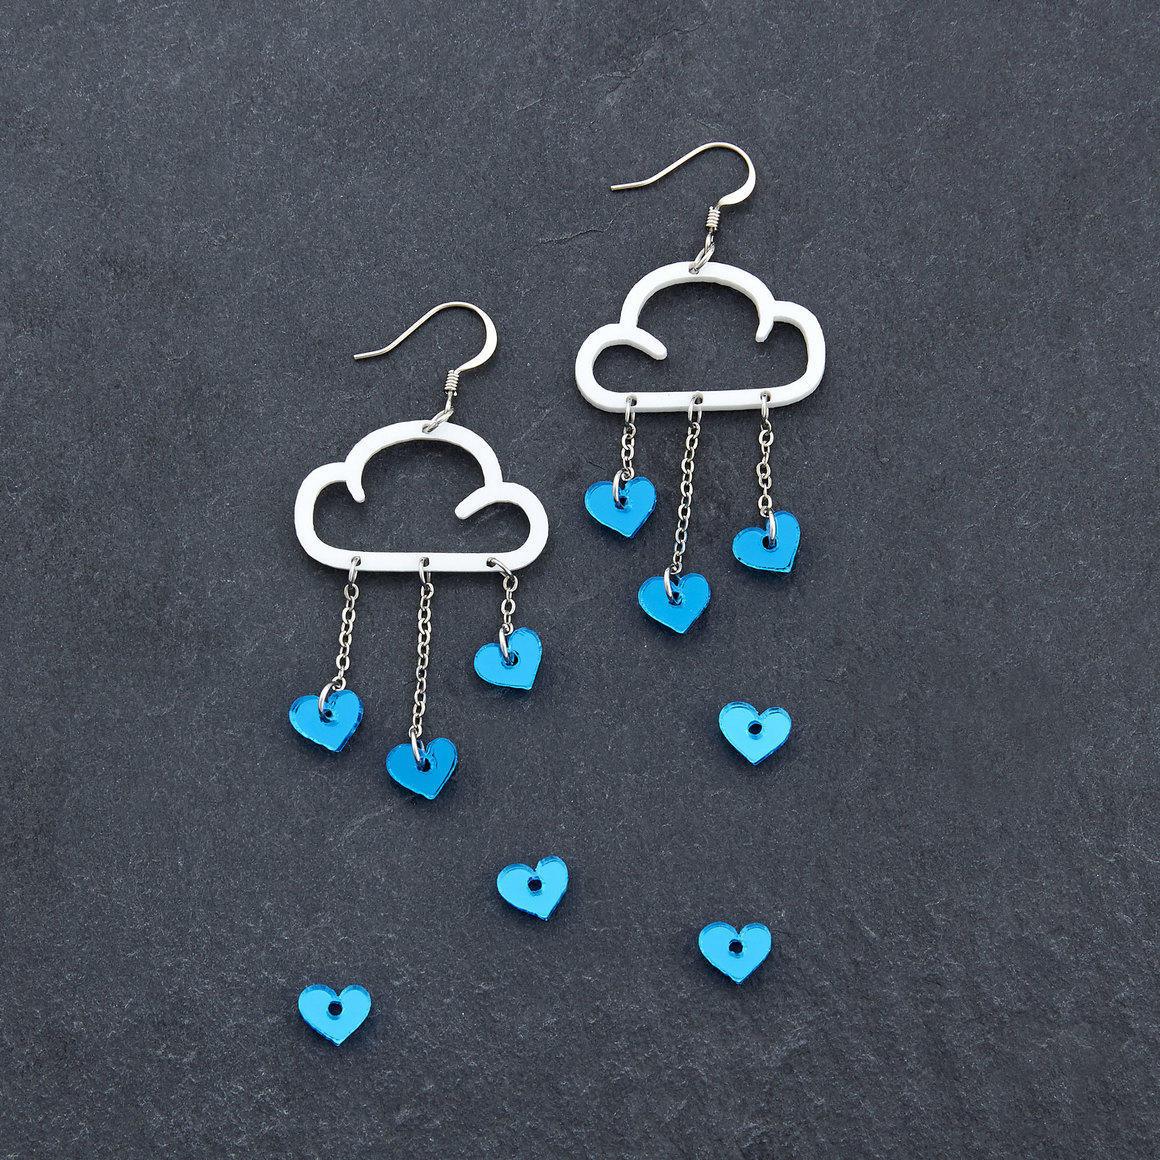 Dangle Earrings - LOVE RAIN - White | Trada Marketplace